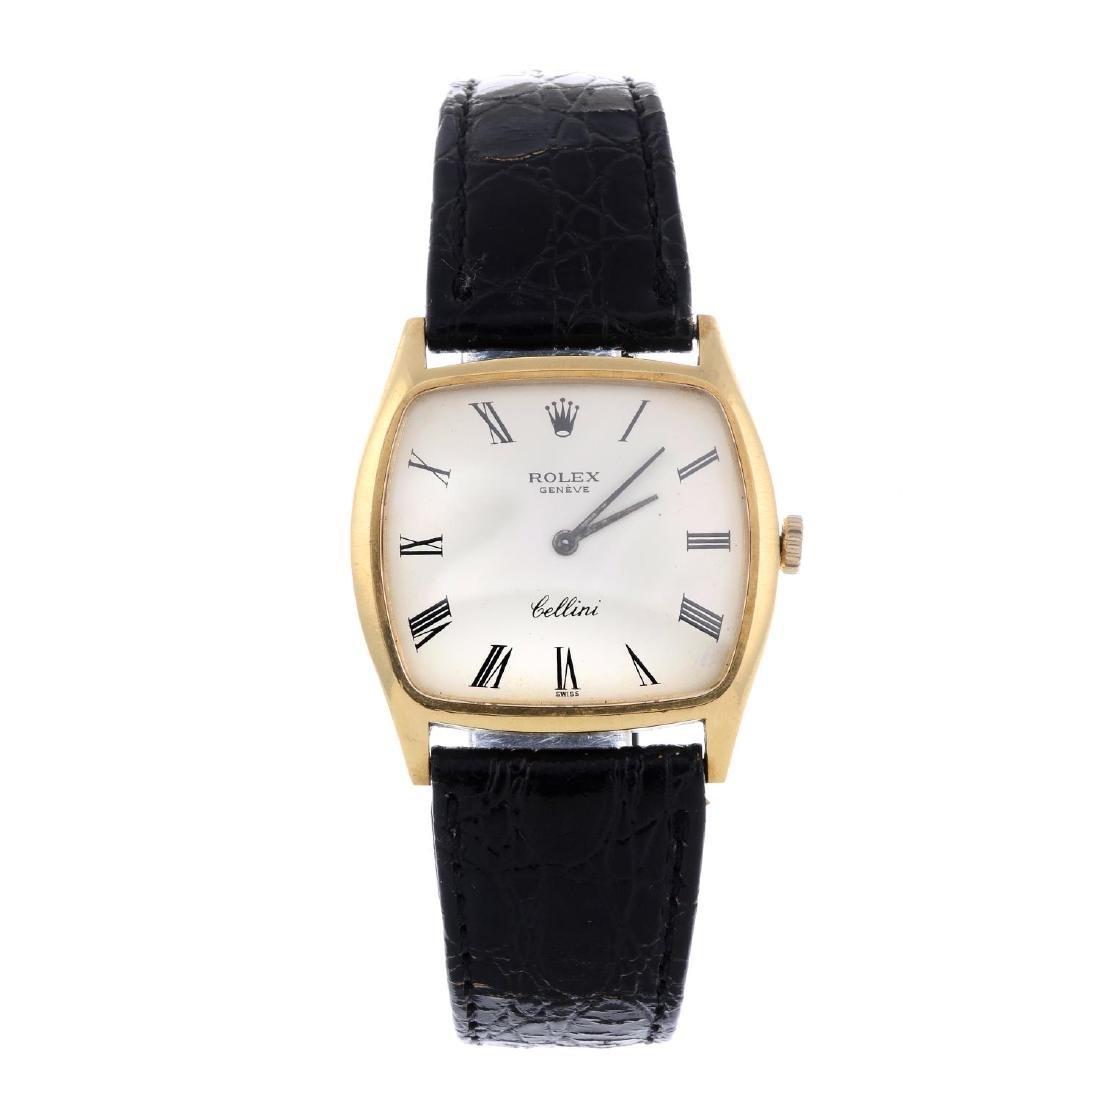 ROLEX - a gentleman's Cellini wrist watch. Circa 1970.